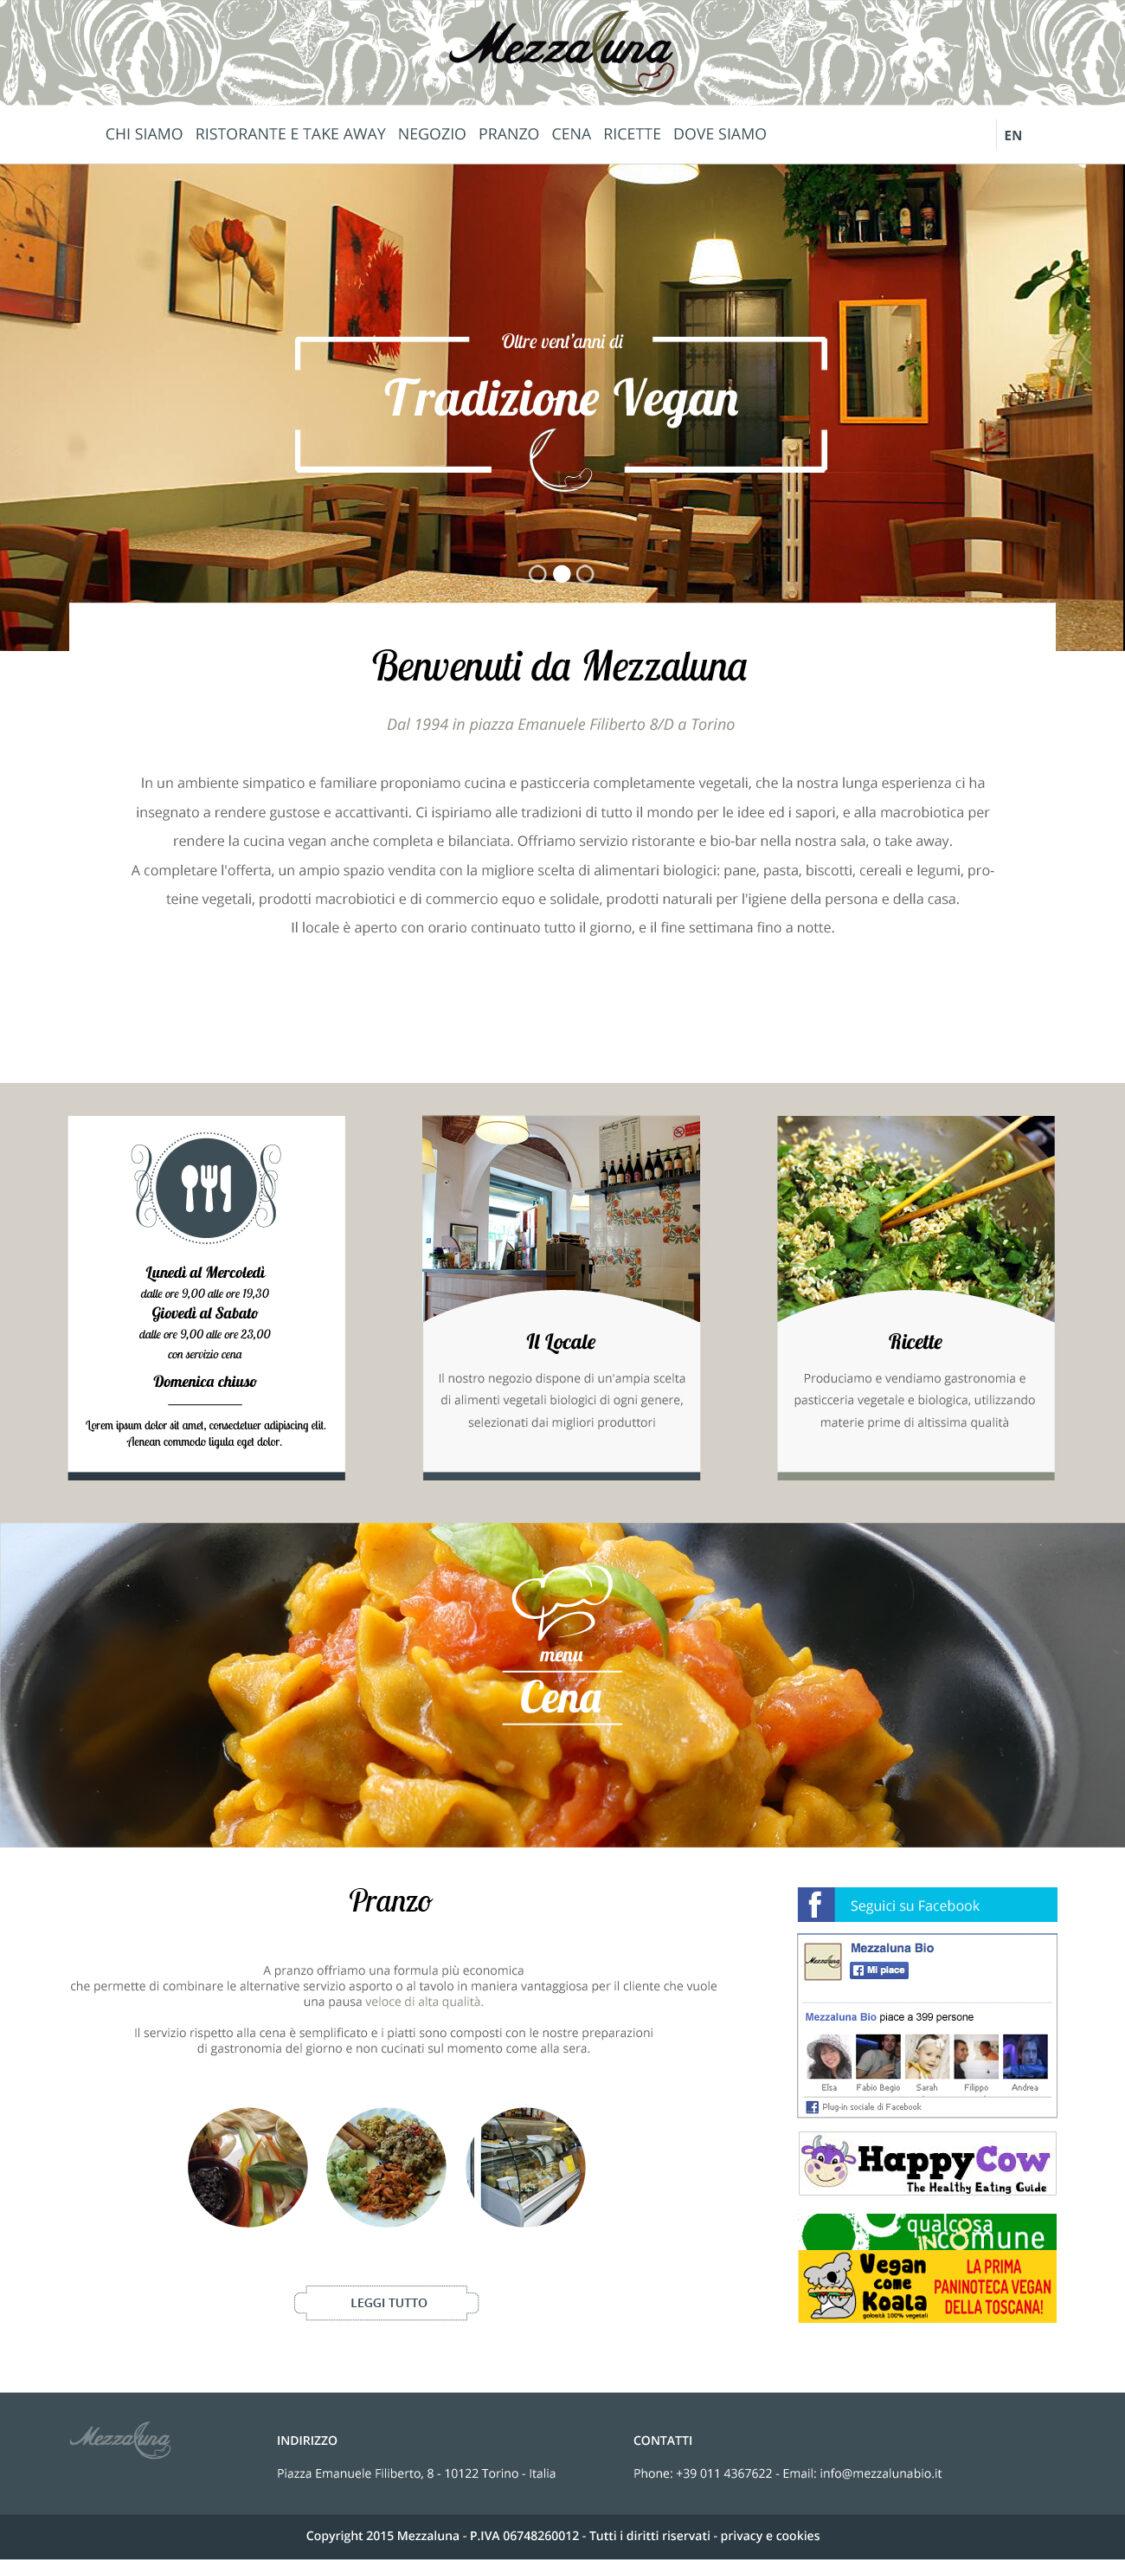 https://maxmaraucci.it/wp-content/uploads/2020/08/MezzalunaBio_03_Homepage-scaled.jpg